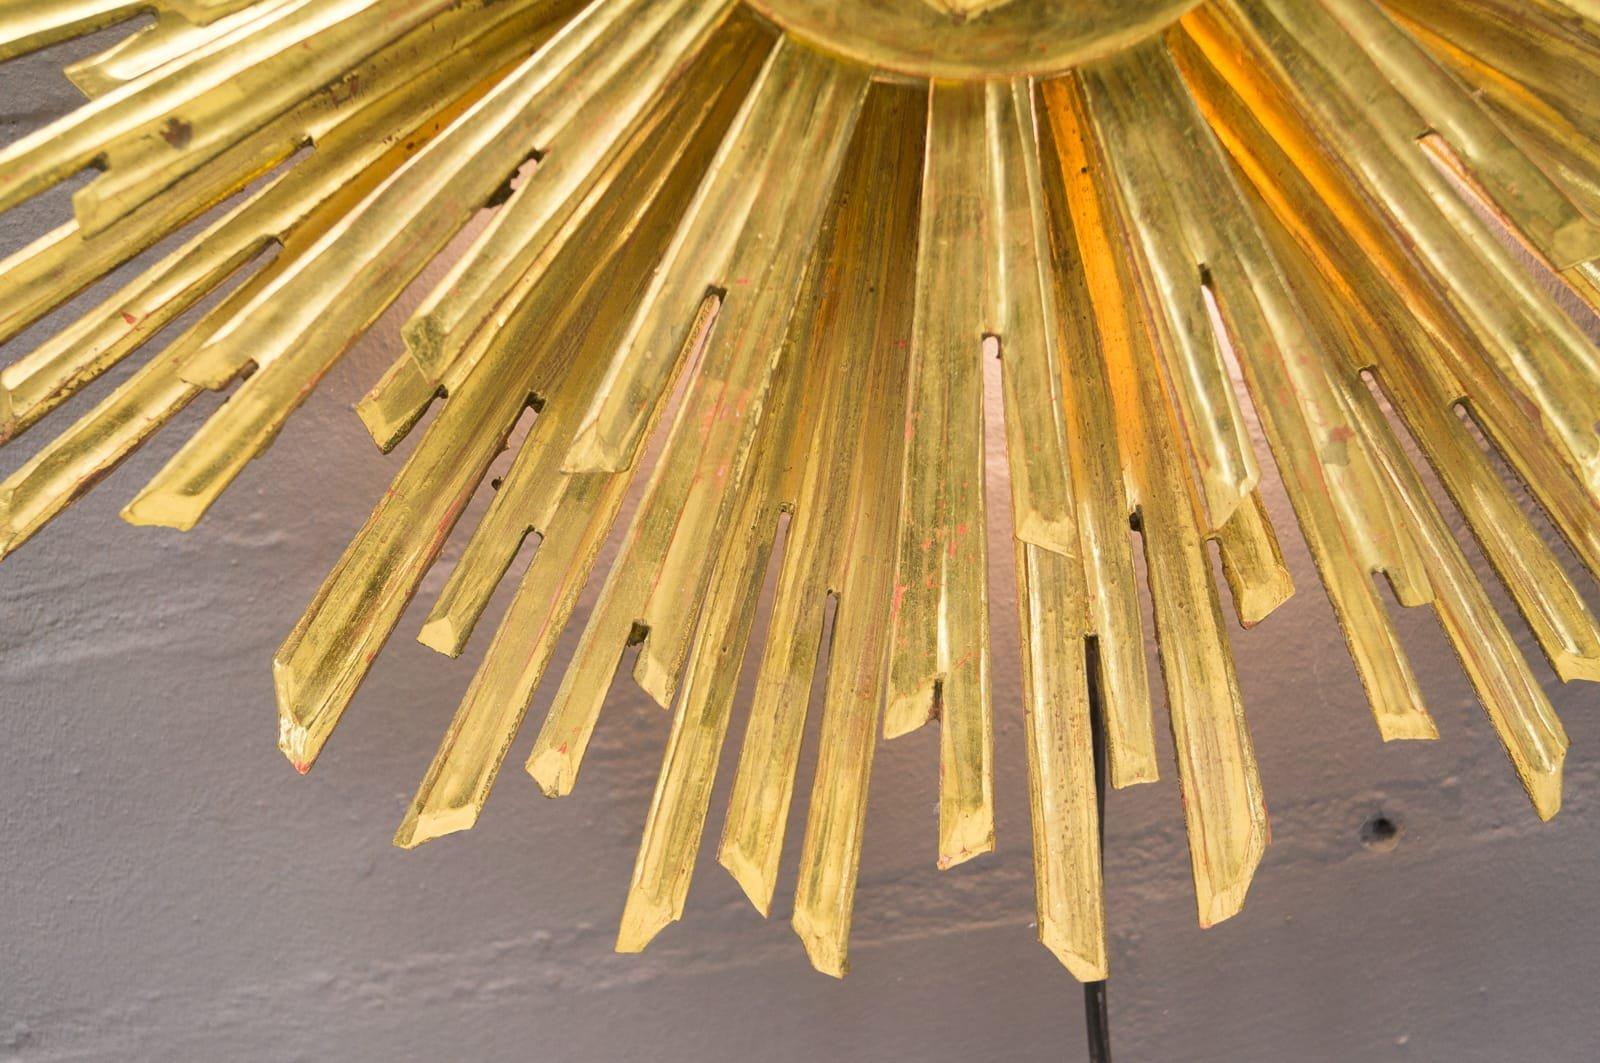 Gro e wandlampe aus holz in sonnen optik 1960er bei for Grosse esstische aus holz